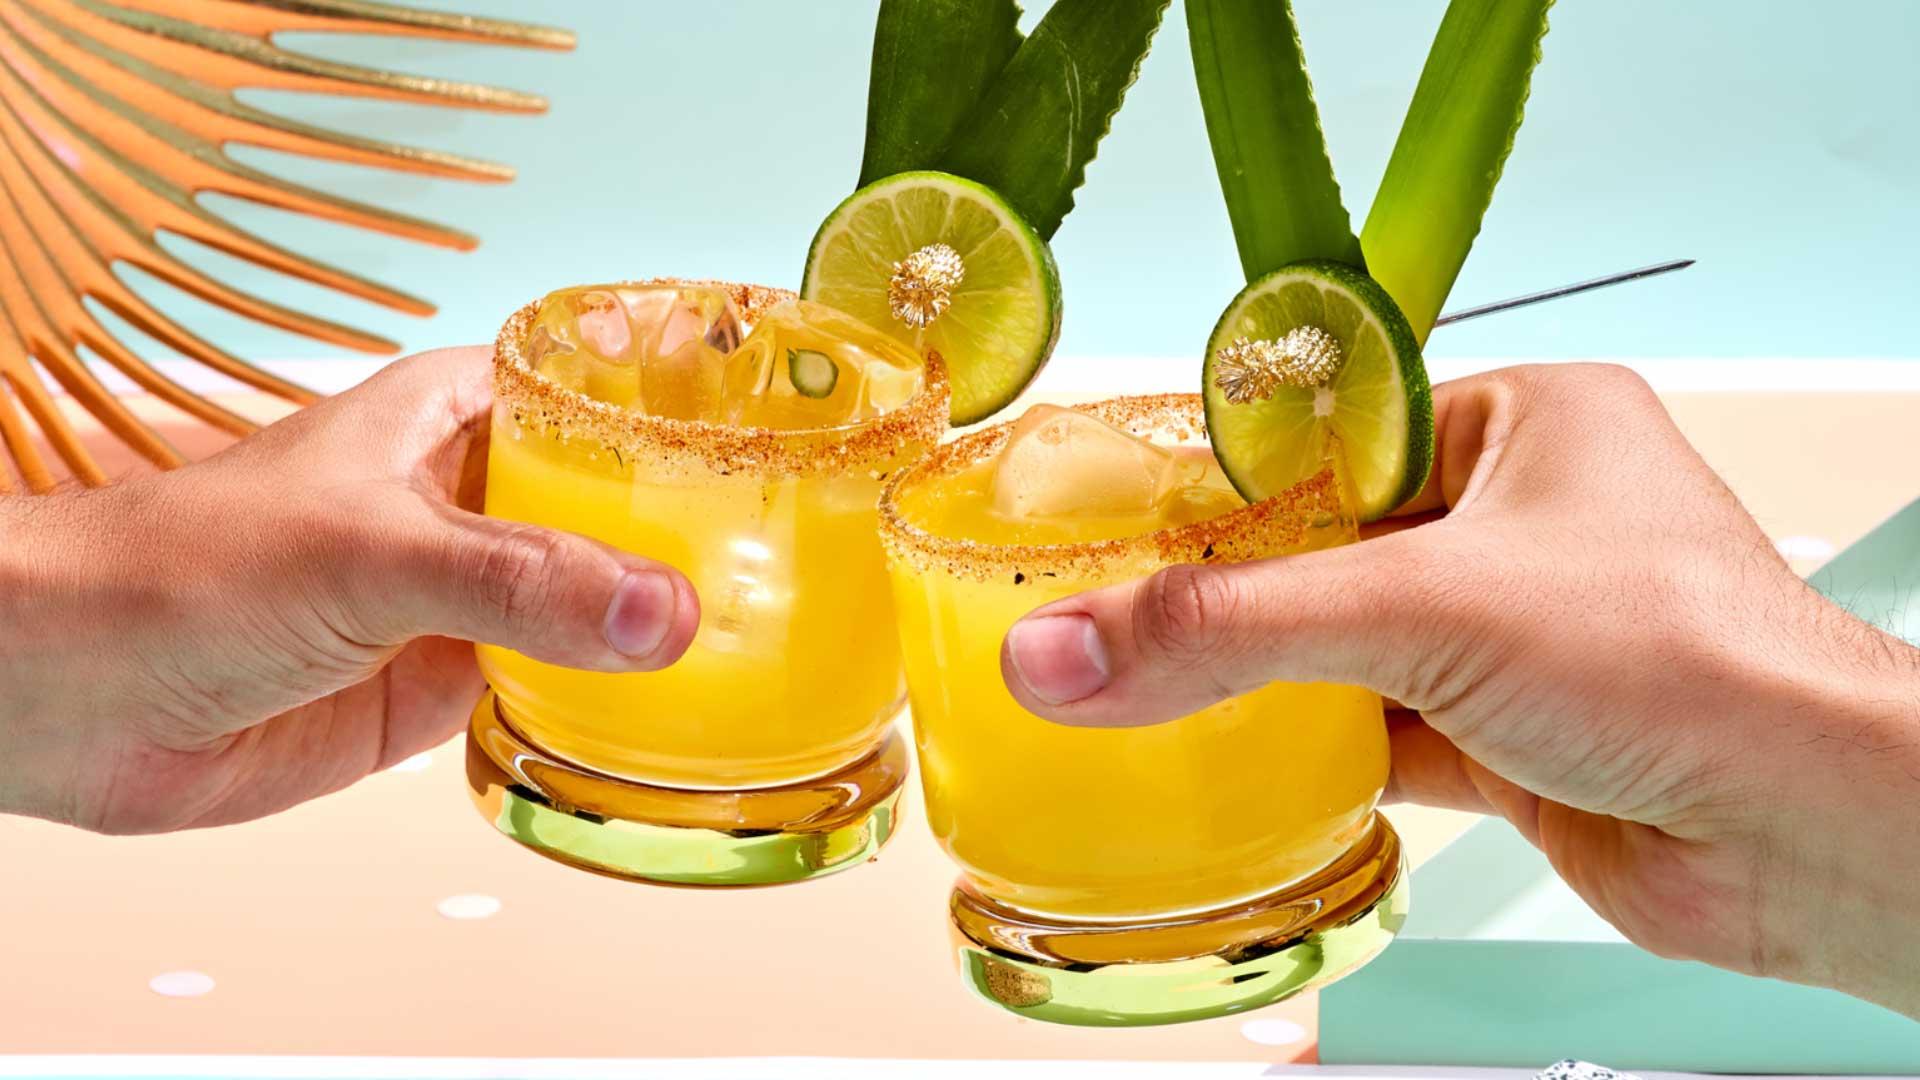 National Margarita Day - Where to drink an original margarita